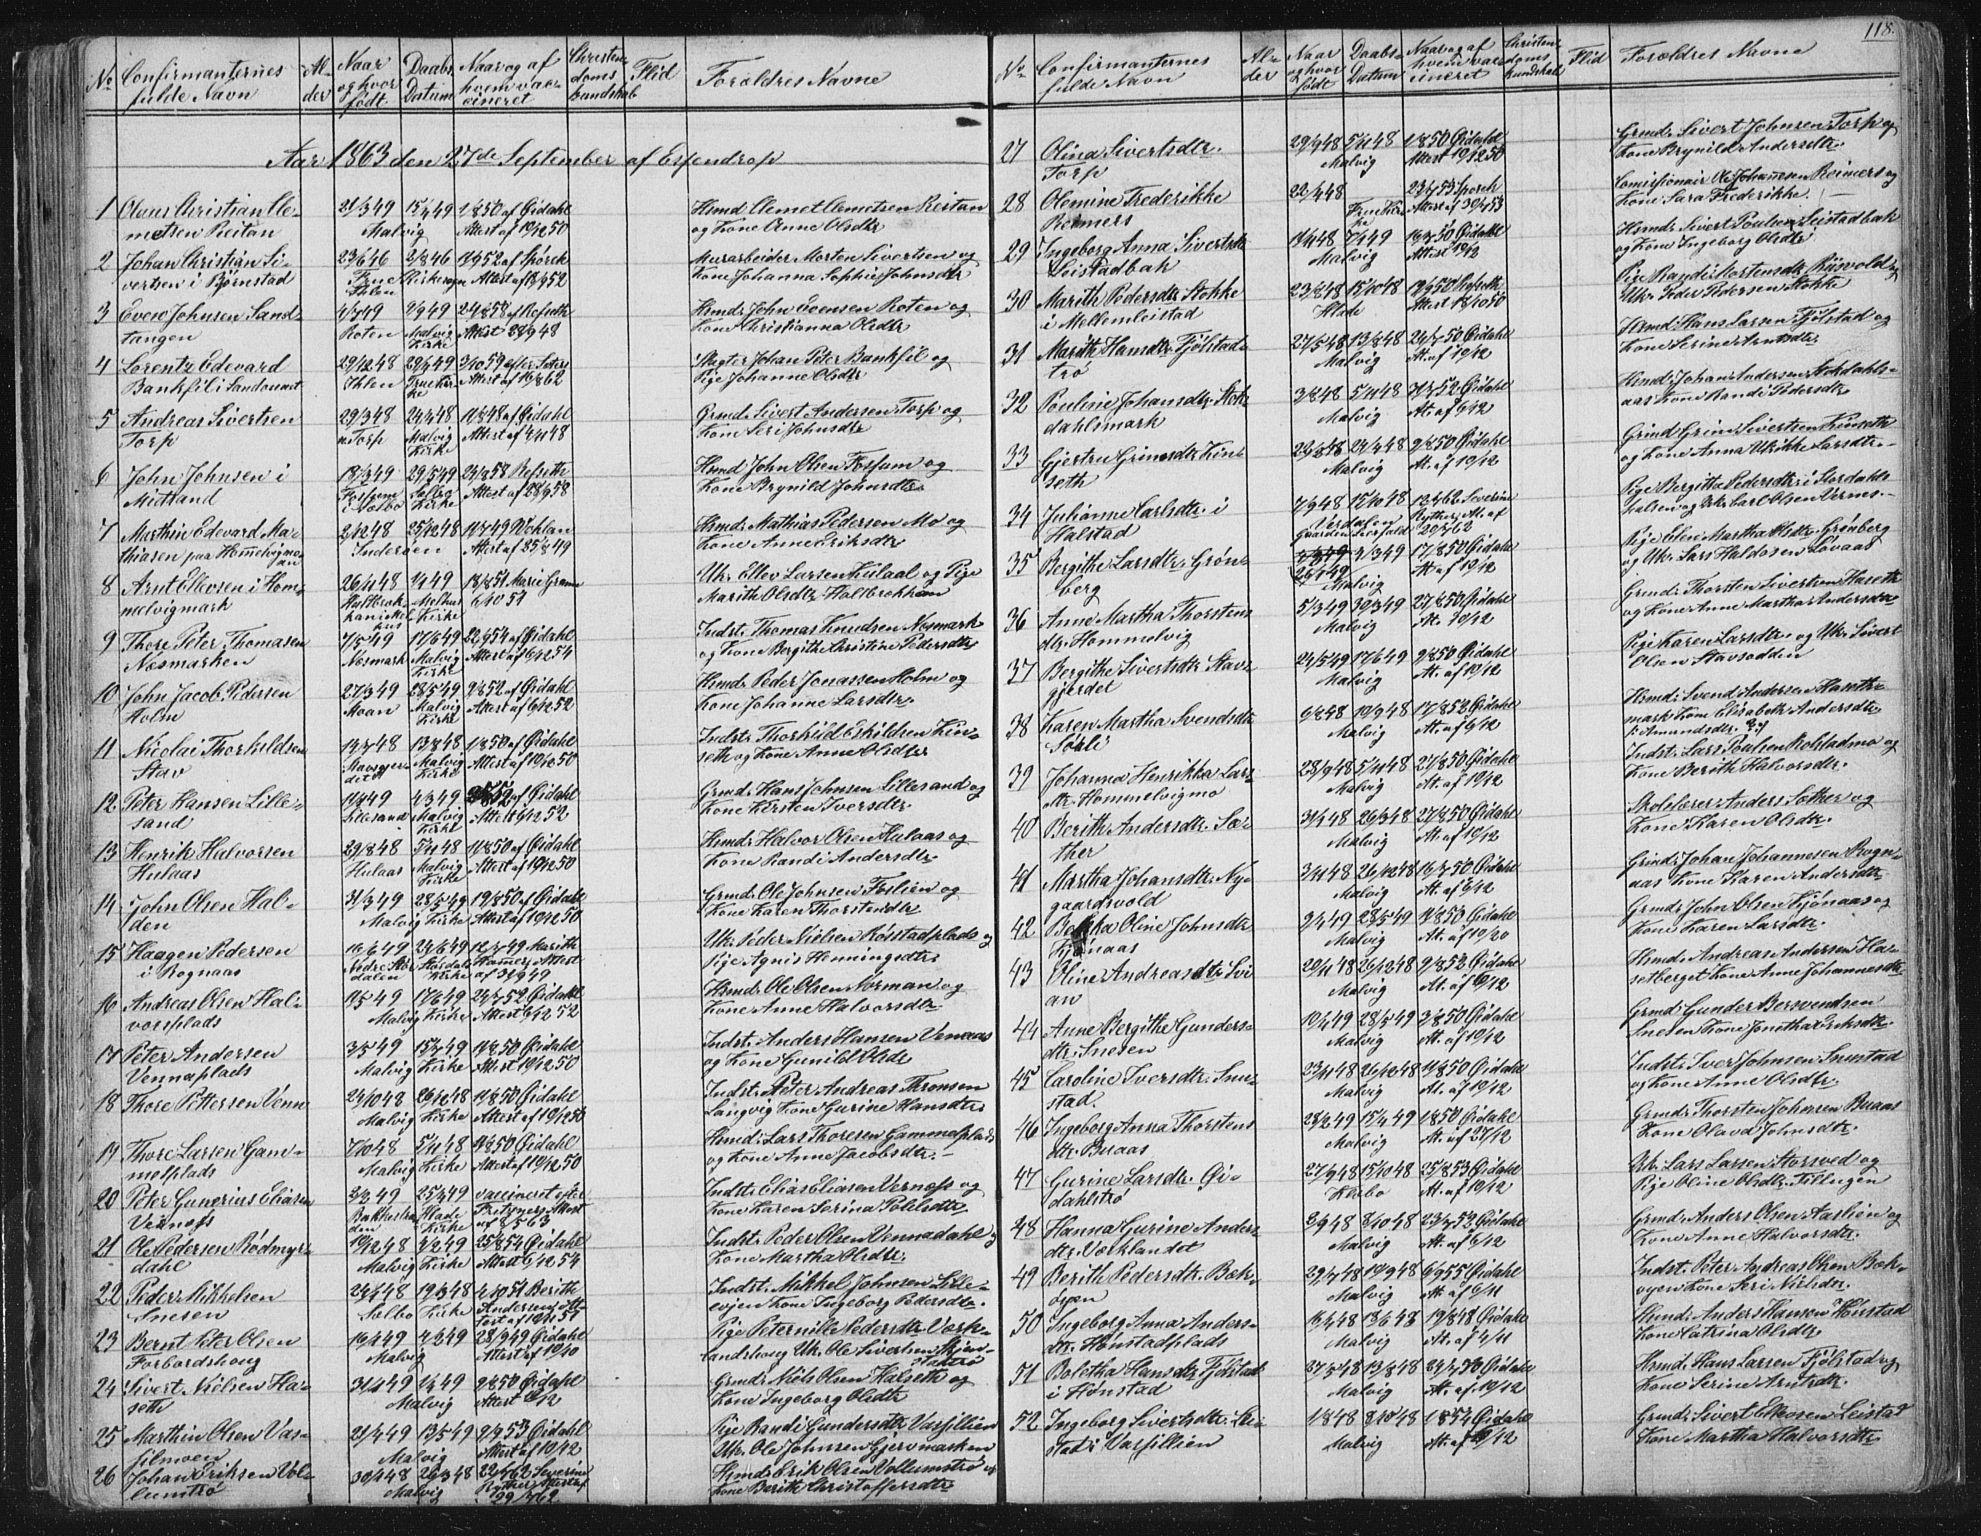 SAT, Ministerialprotokoller, klokkerbøker og fødselsregistre - Sør-Trøndelag, 616/L0406: Parish register (official) no. 616A03, 1843-1879, p. 118